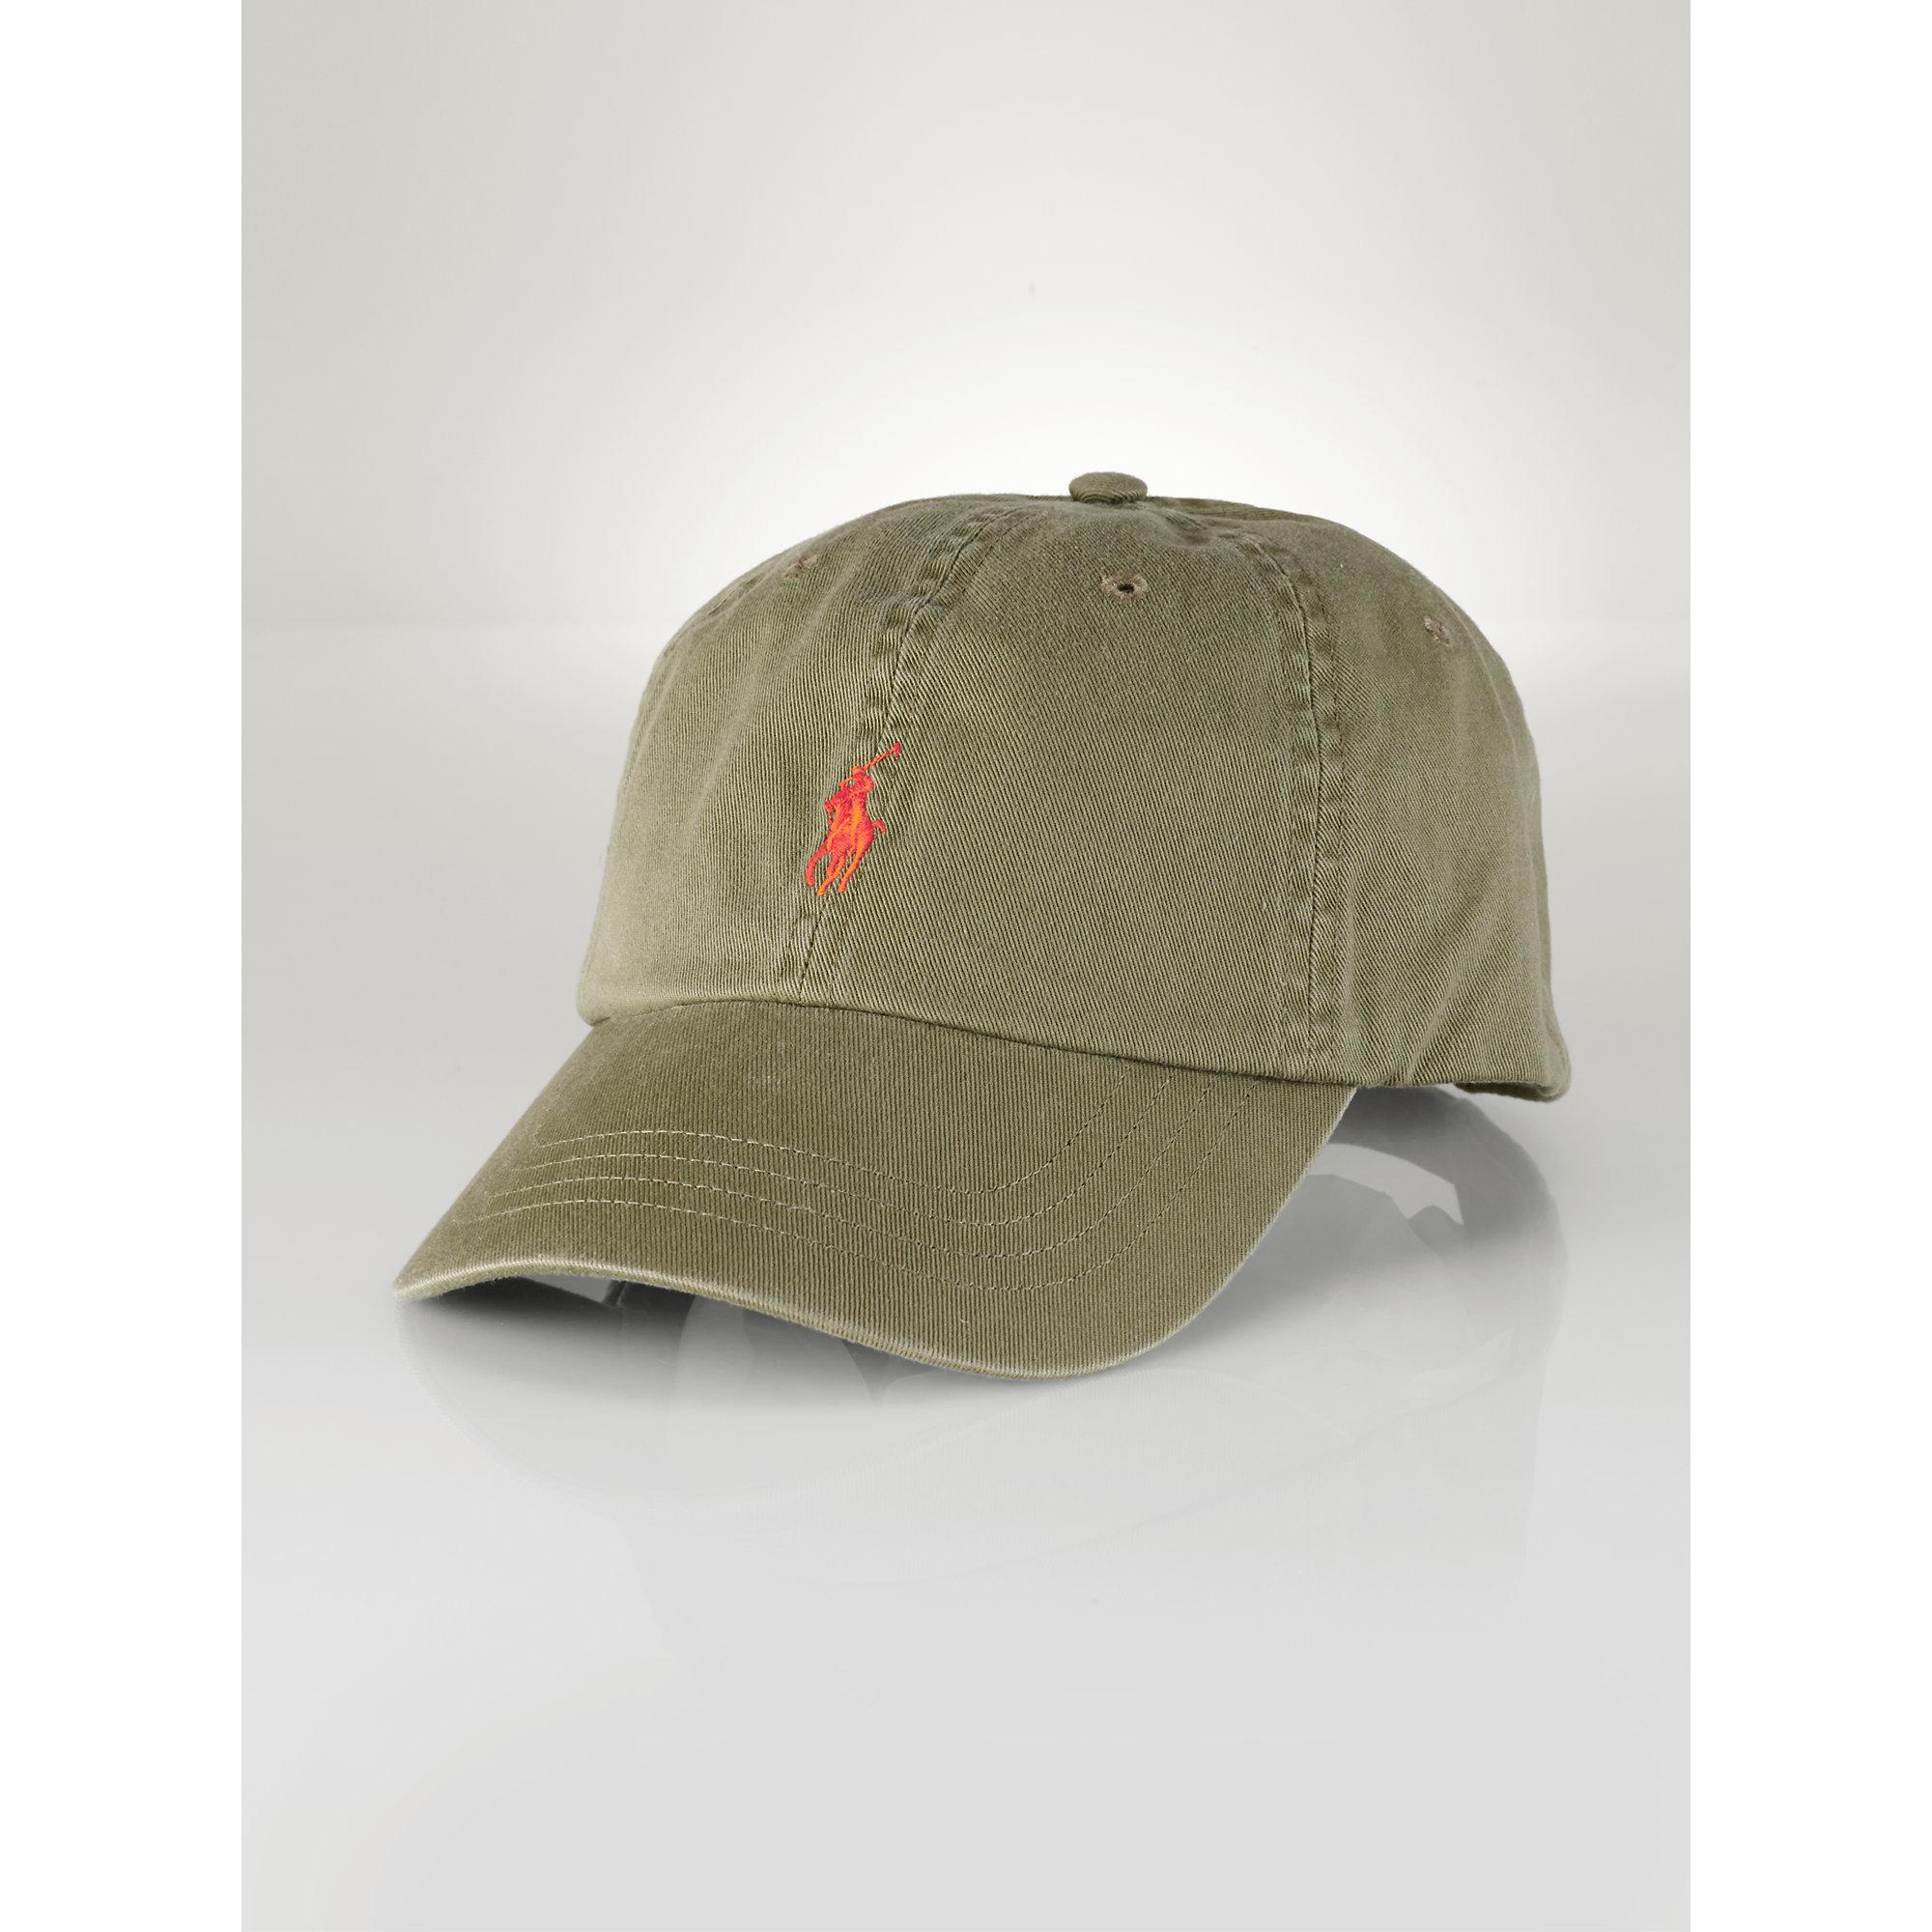 Lyst - Polo Ralph Lauren Chino Baseball Hat in Green for Men 9de0870d6dd